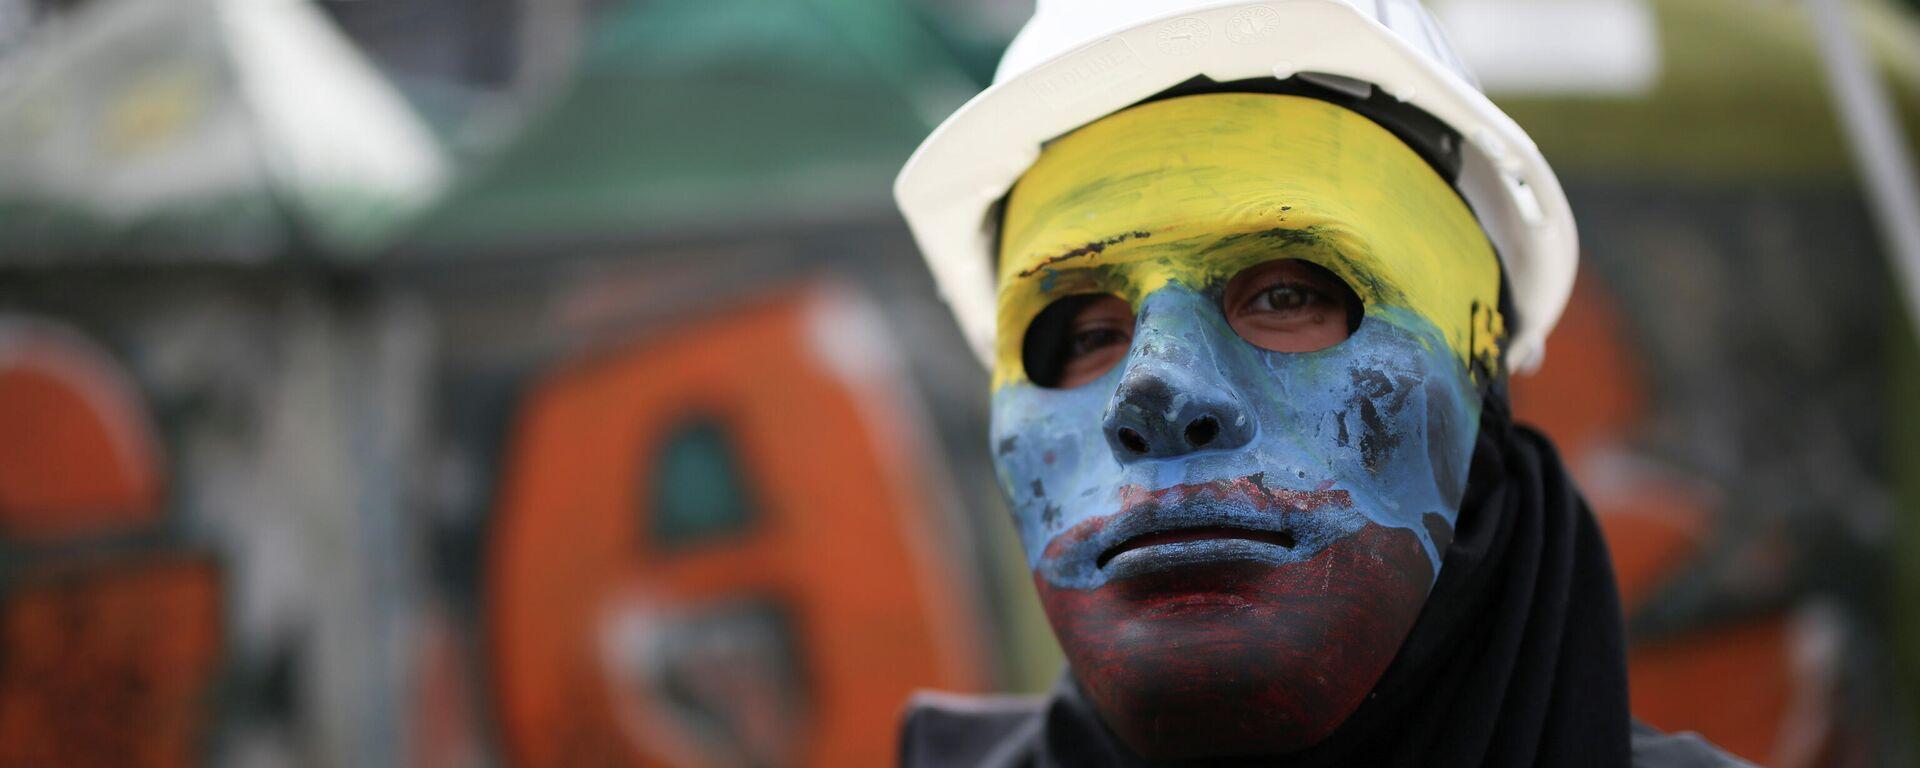 Protesta en Colombia - Sputnik Mundo, 1920, 28.05.2021